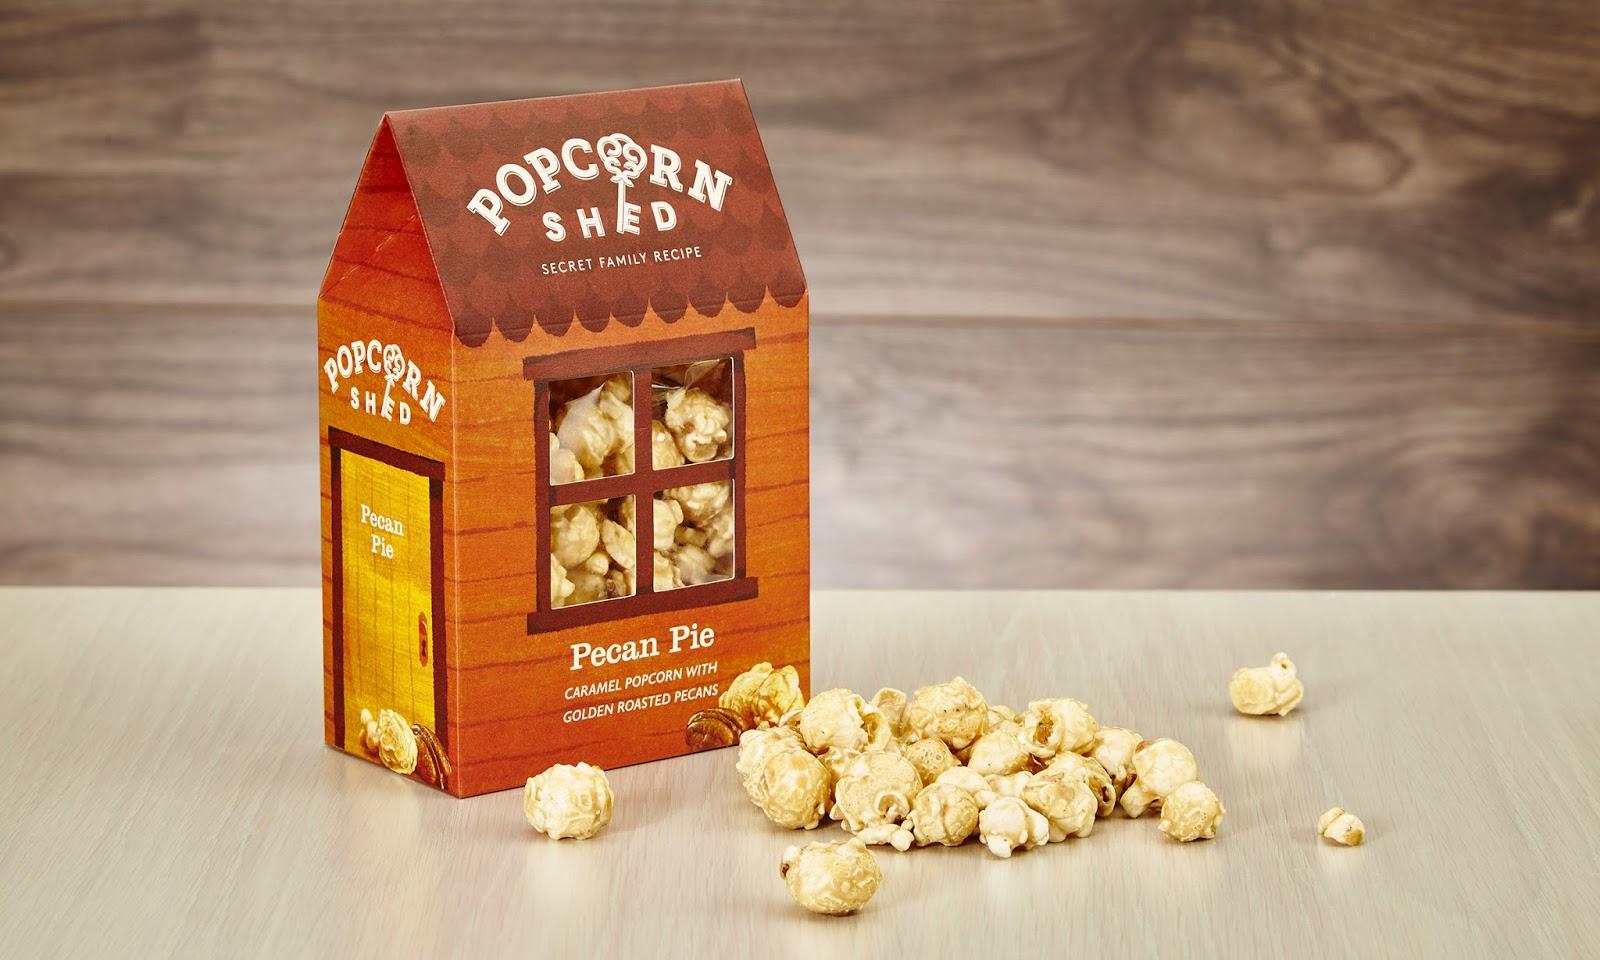 popcorn_shed_1